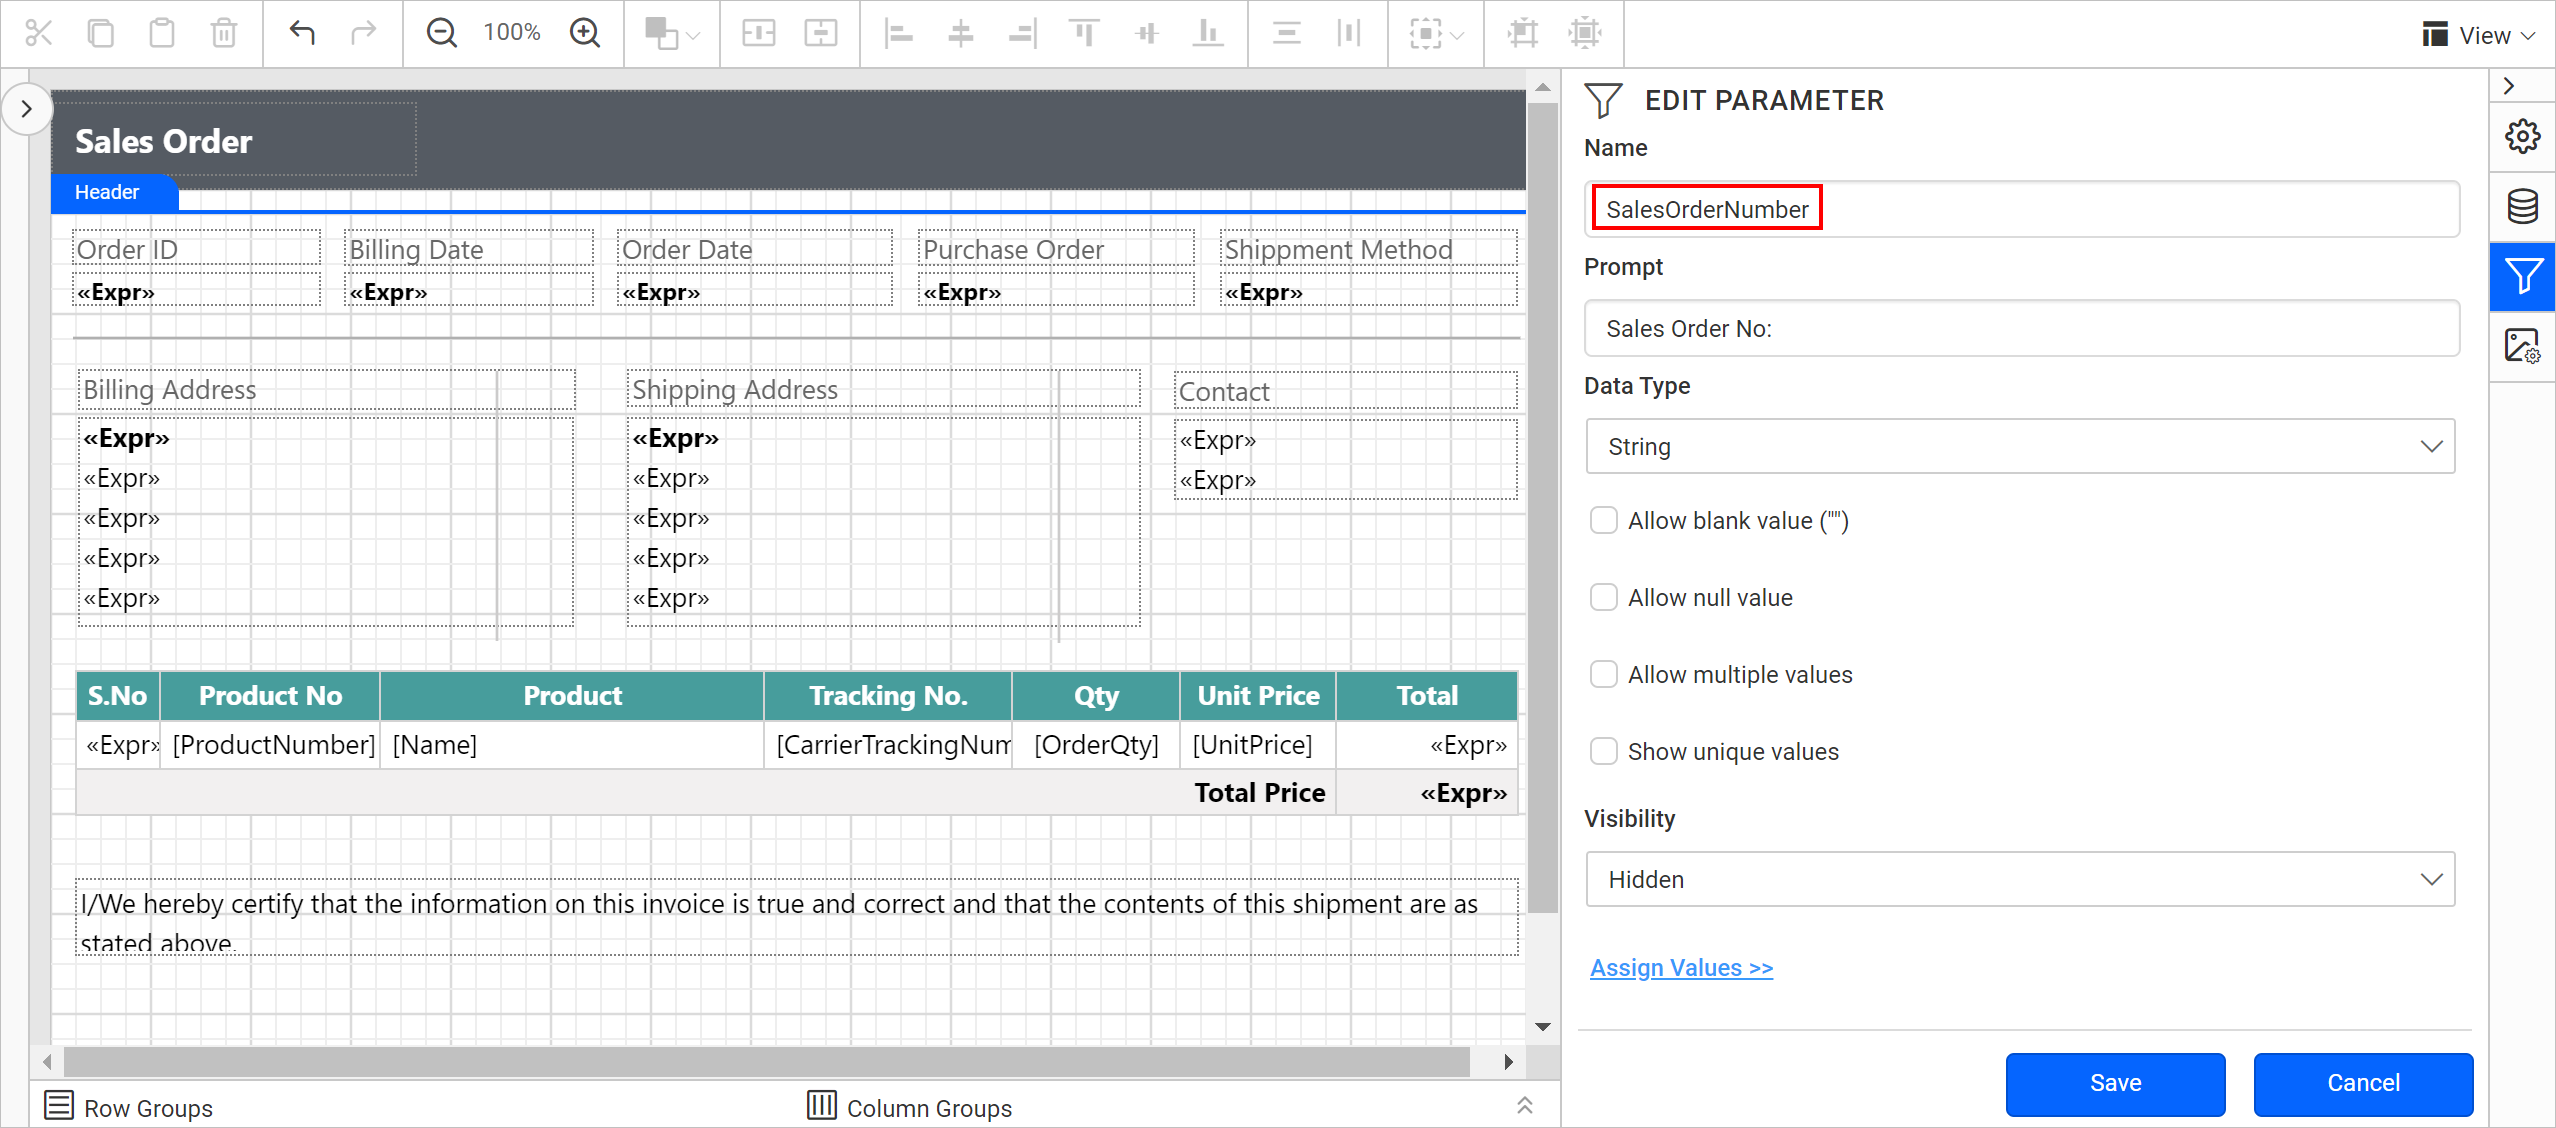 Sales order parameter